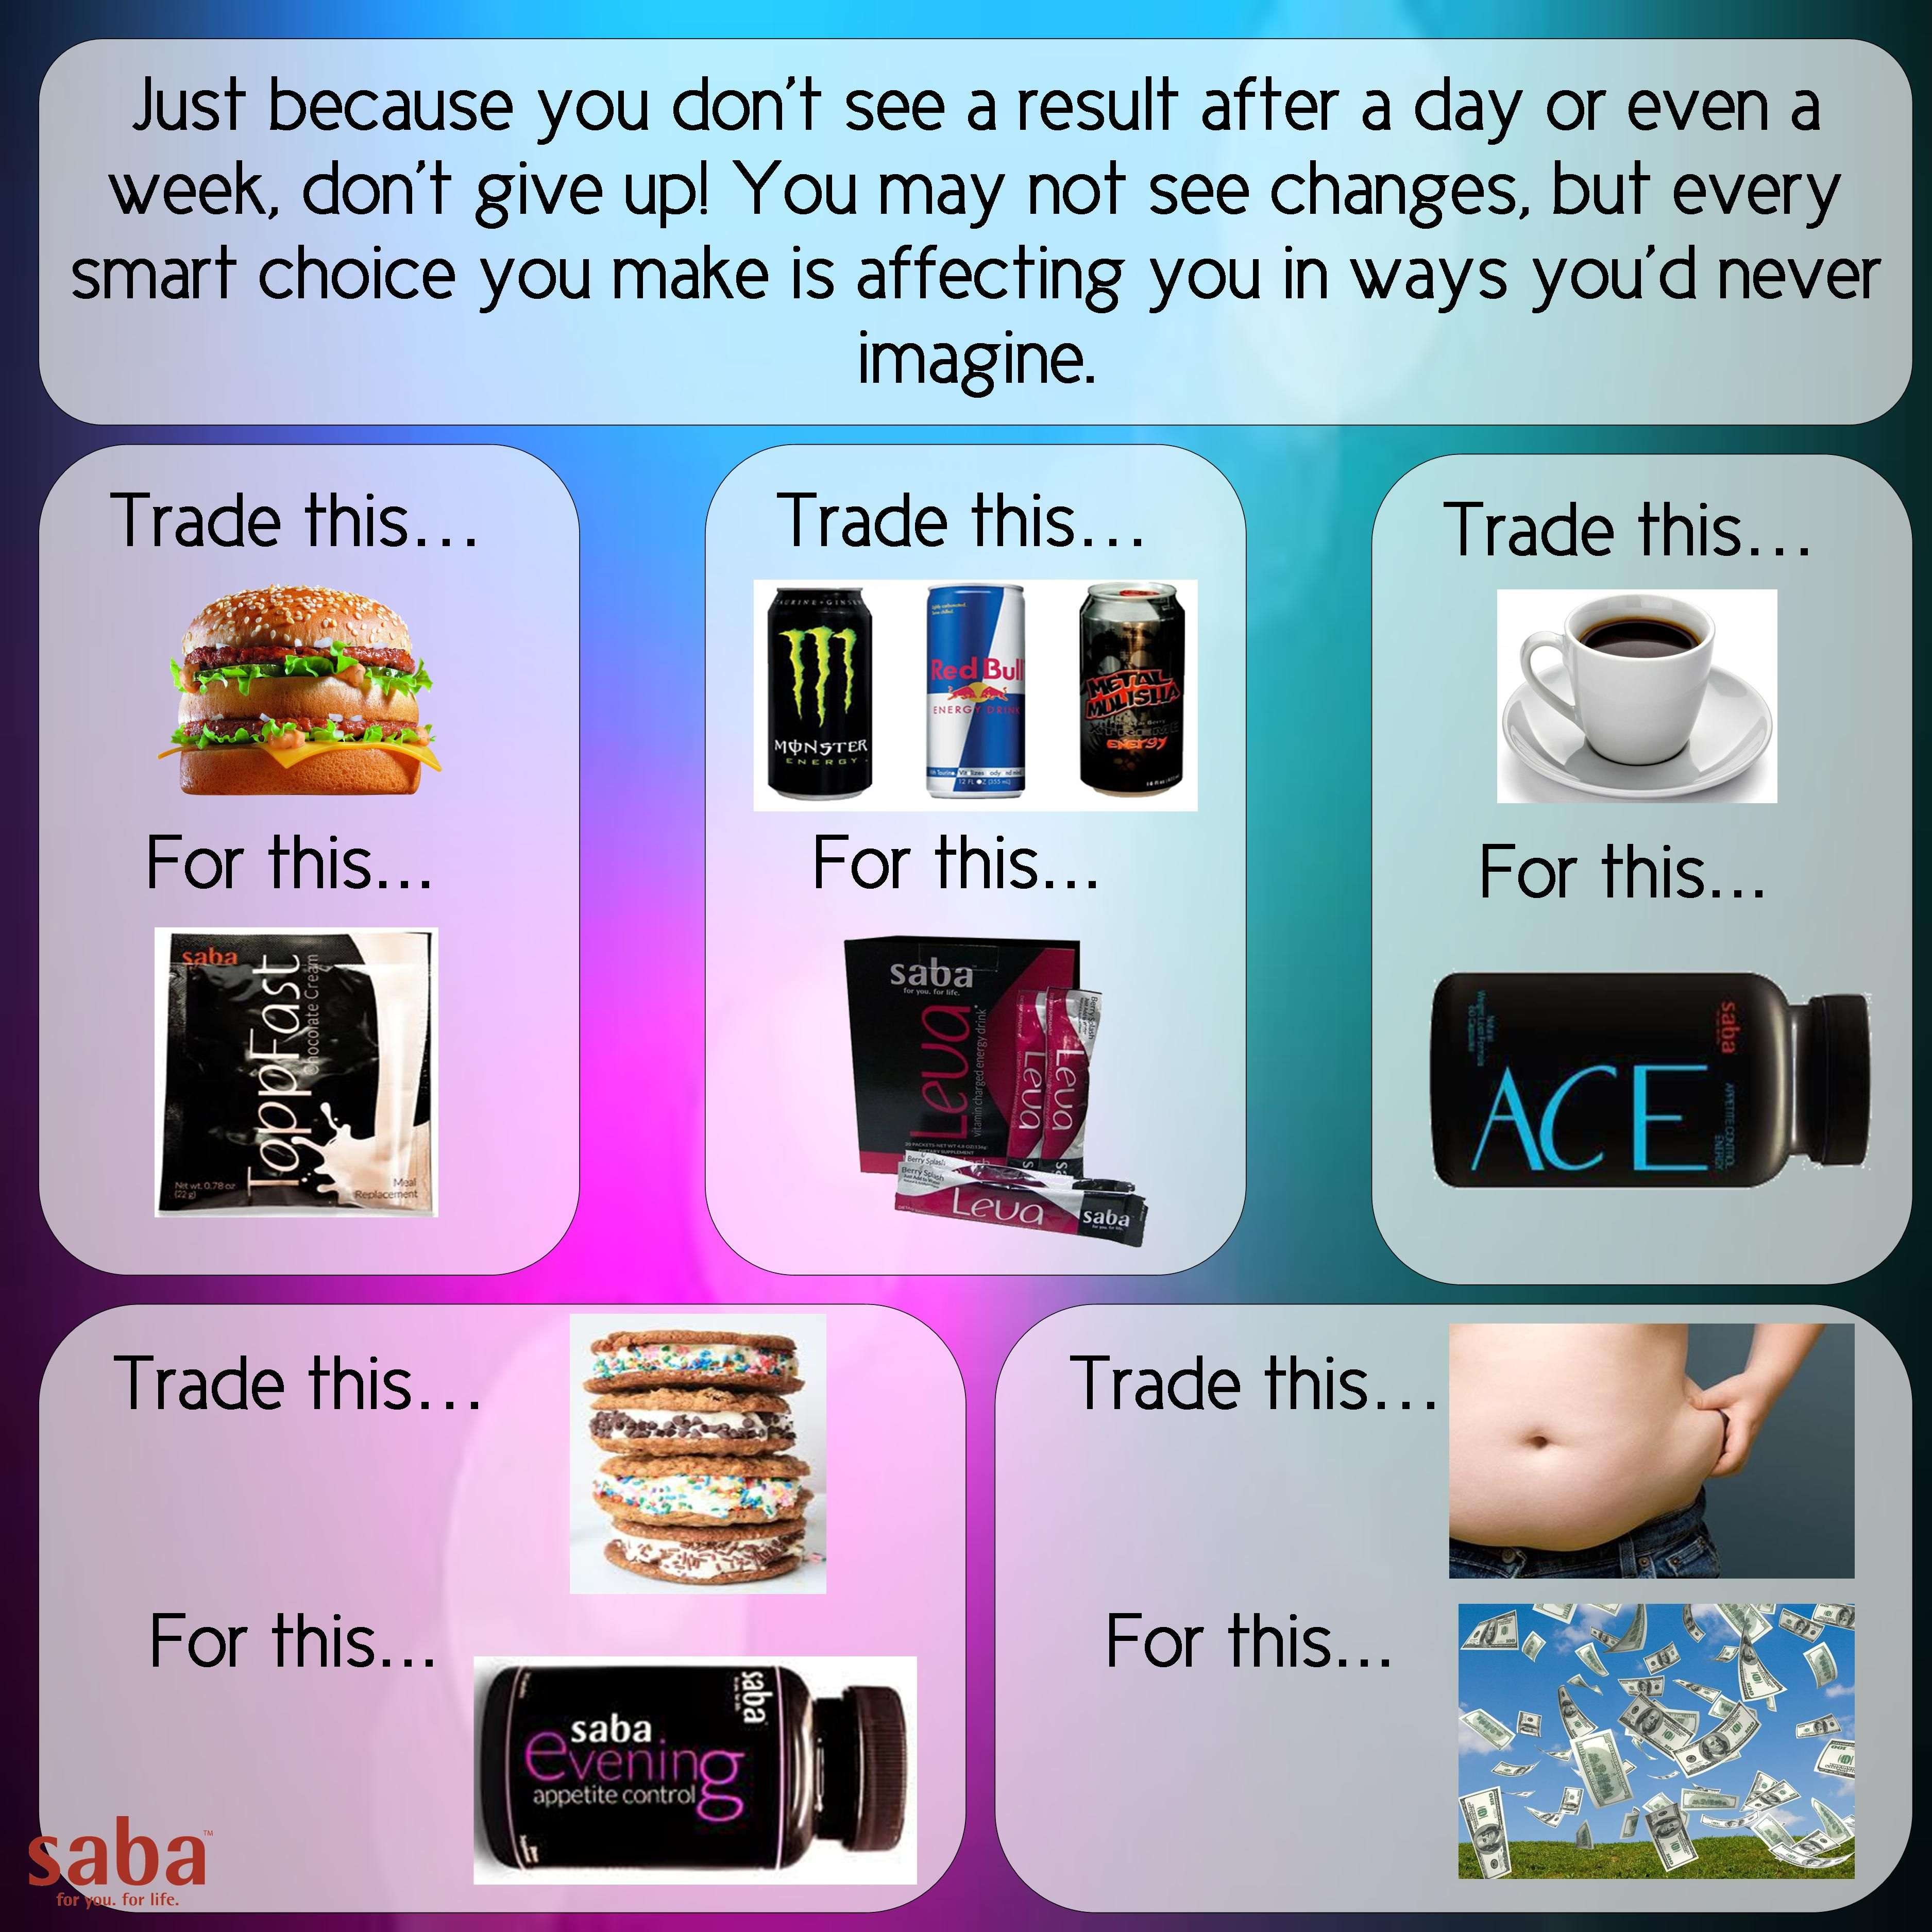 Vip weight loss trio slim picture 5